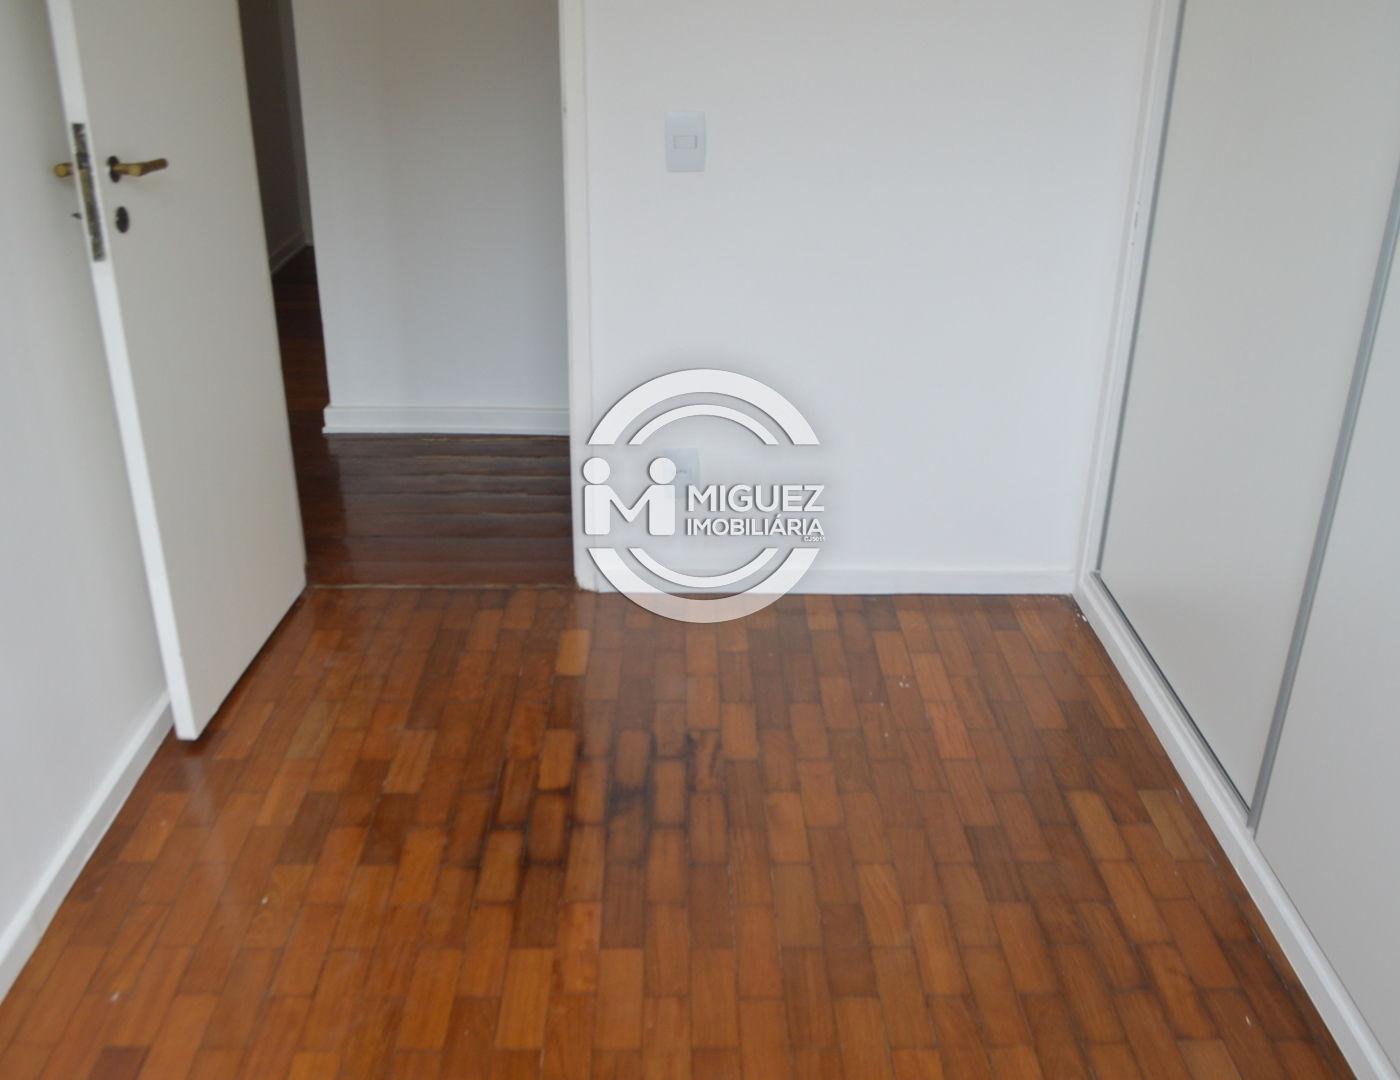 Apartamento, aluguel, Rua Conde de Bonfim - Tijuca , Rio de janeiro